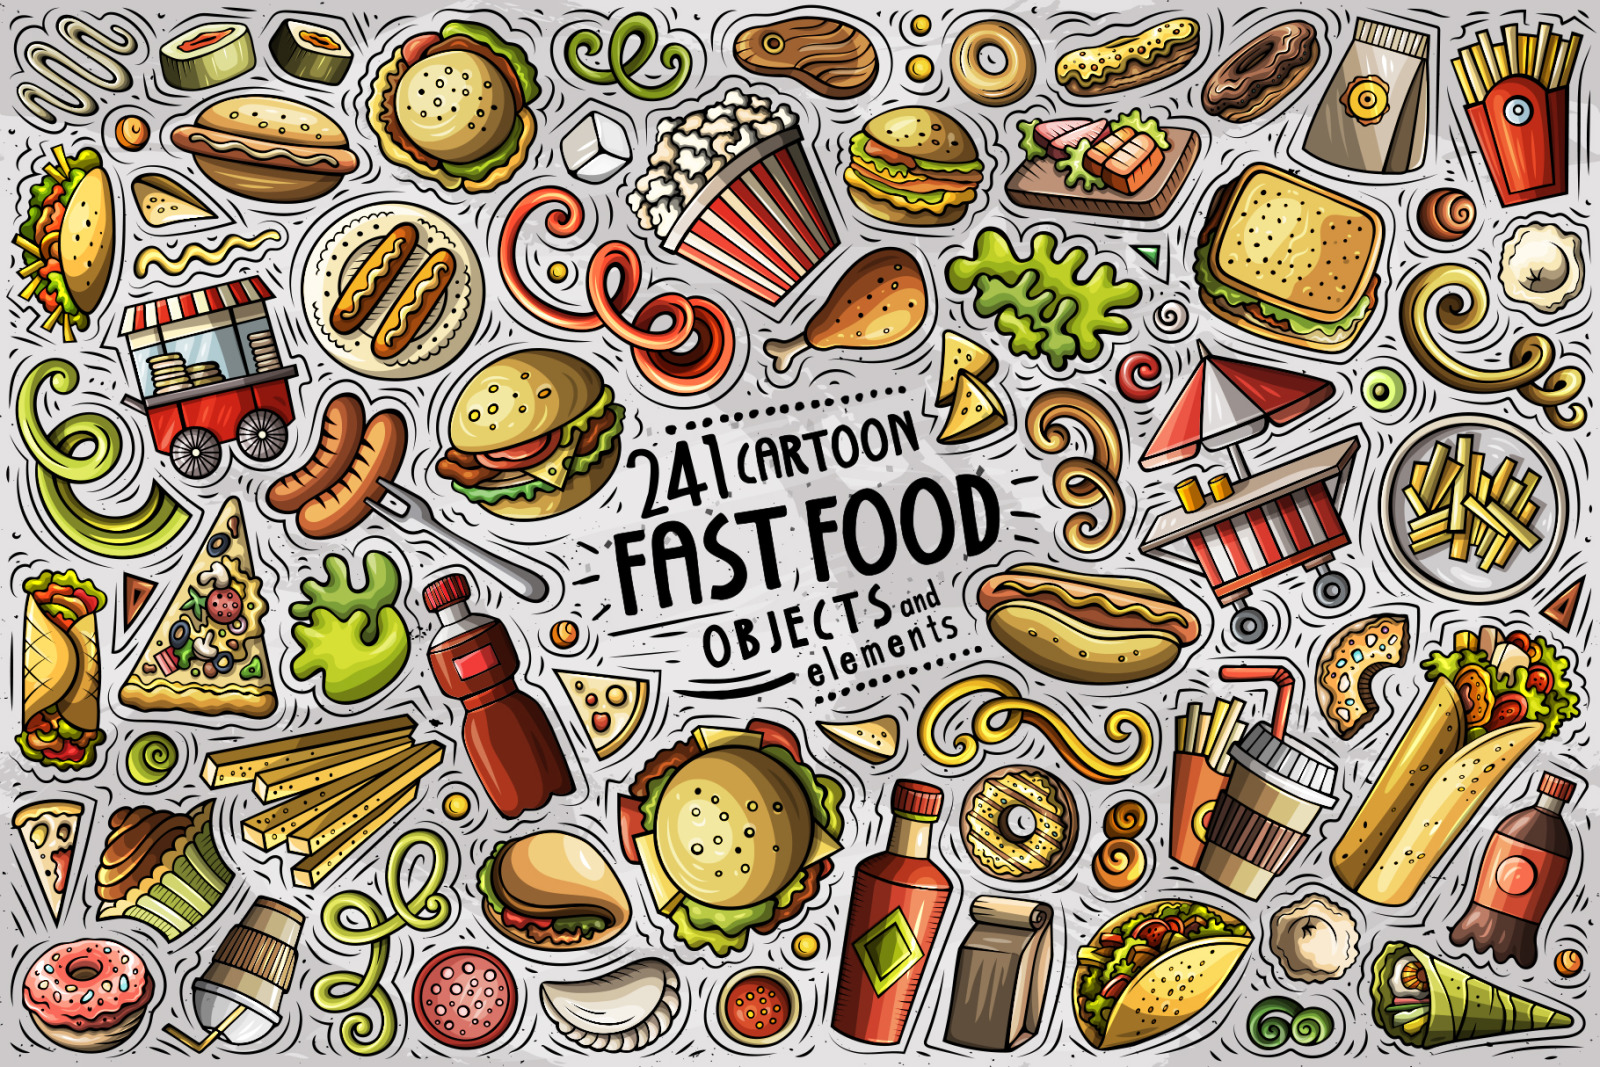 Fast Food Cartoon Vector Objects Set